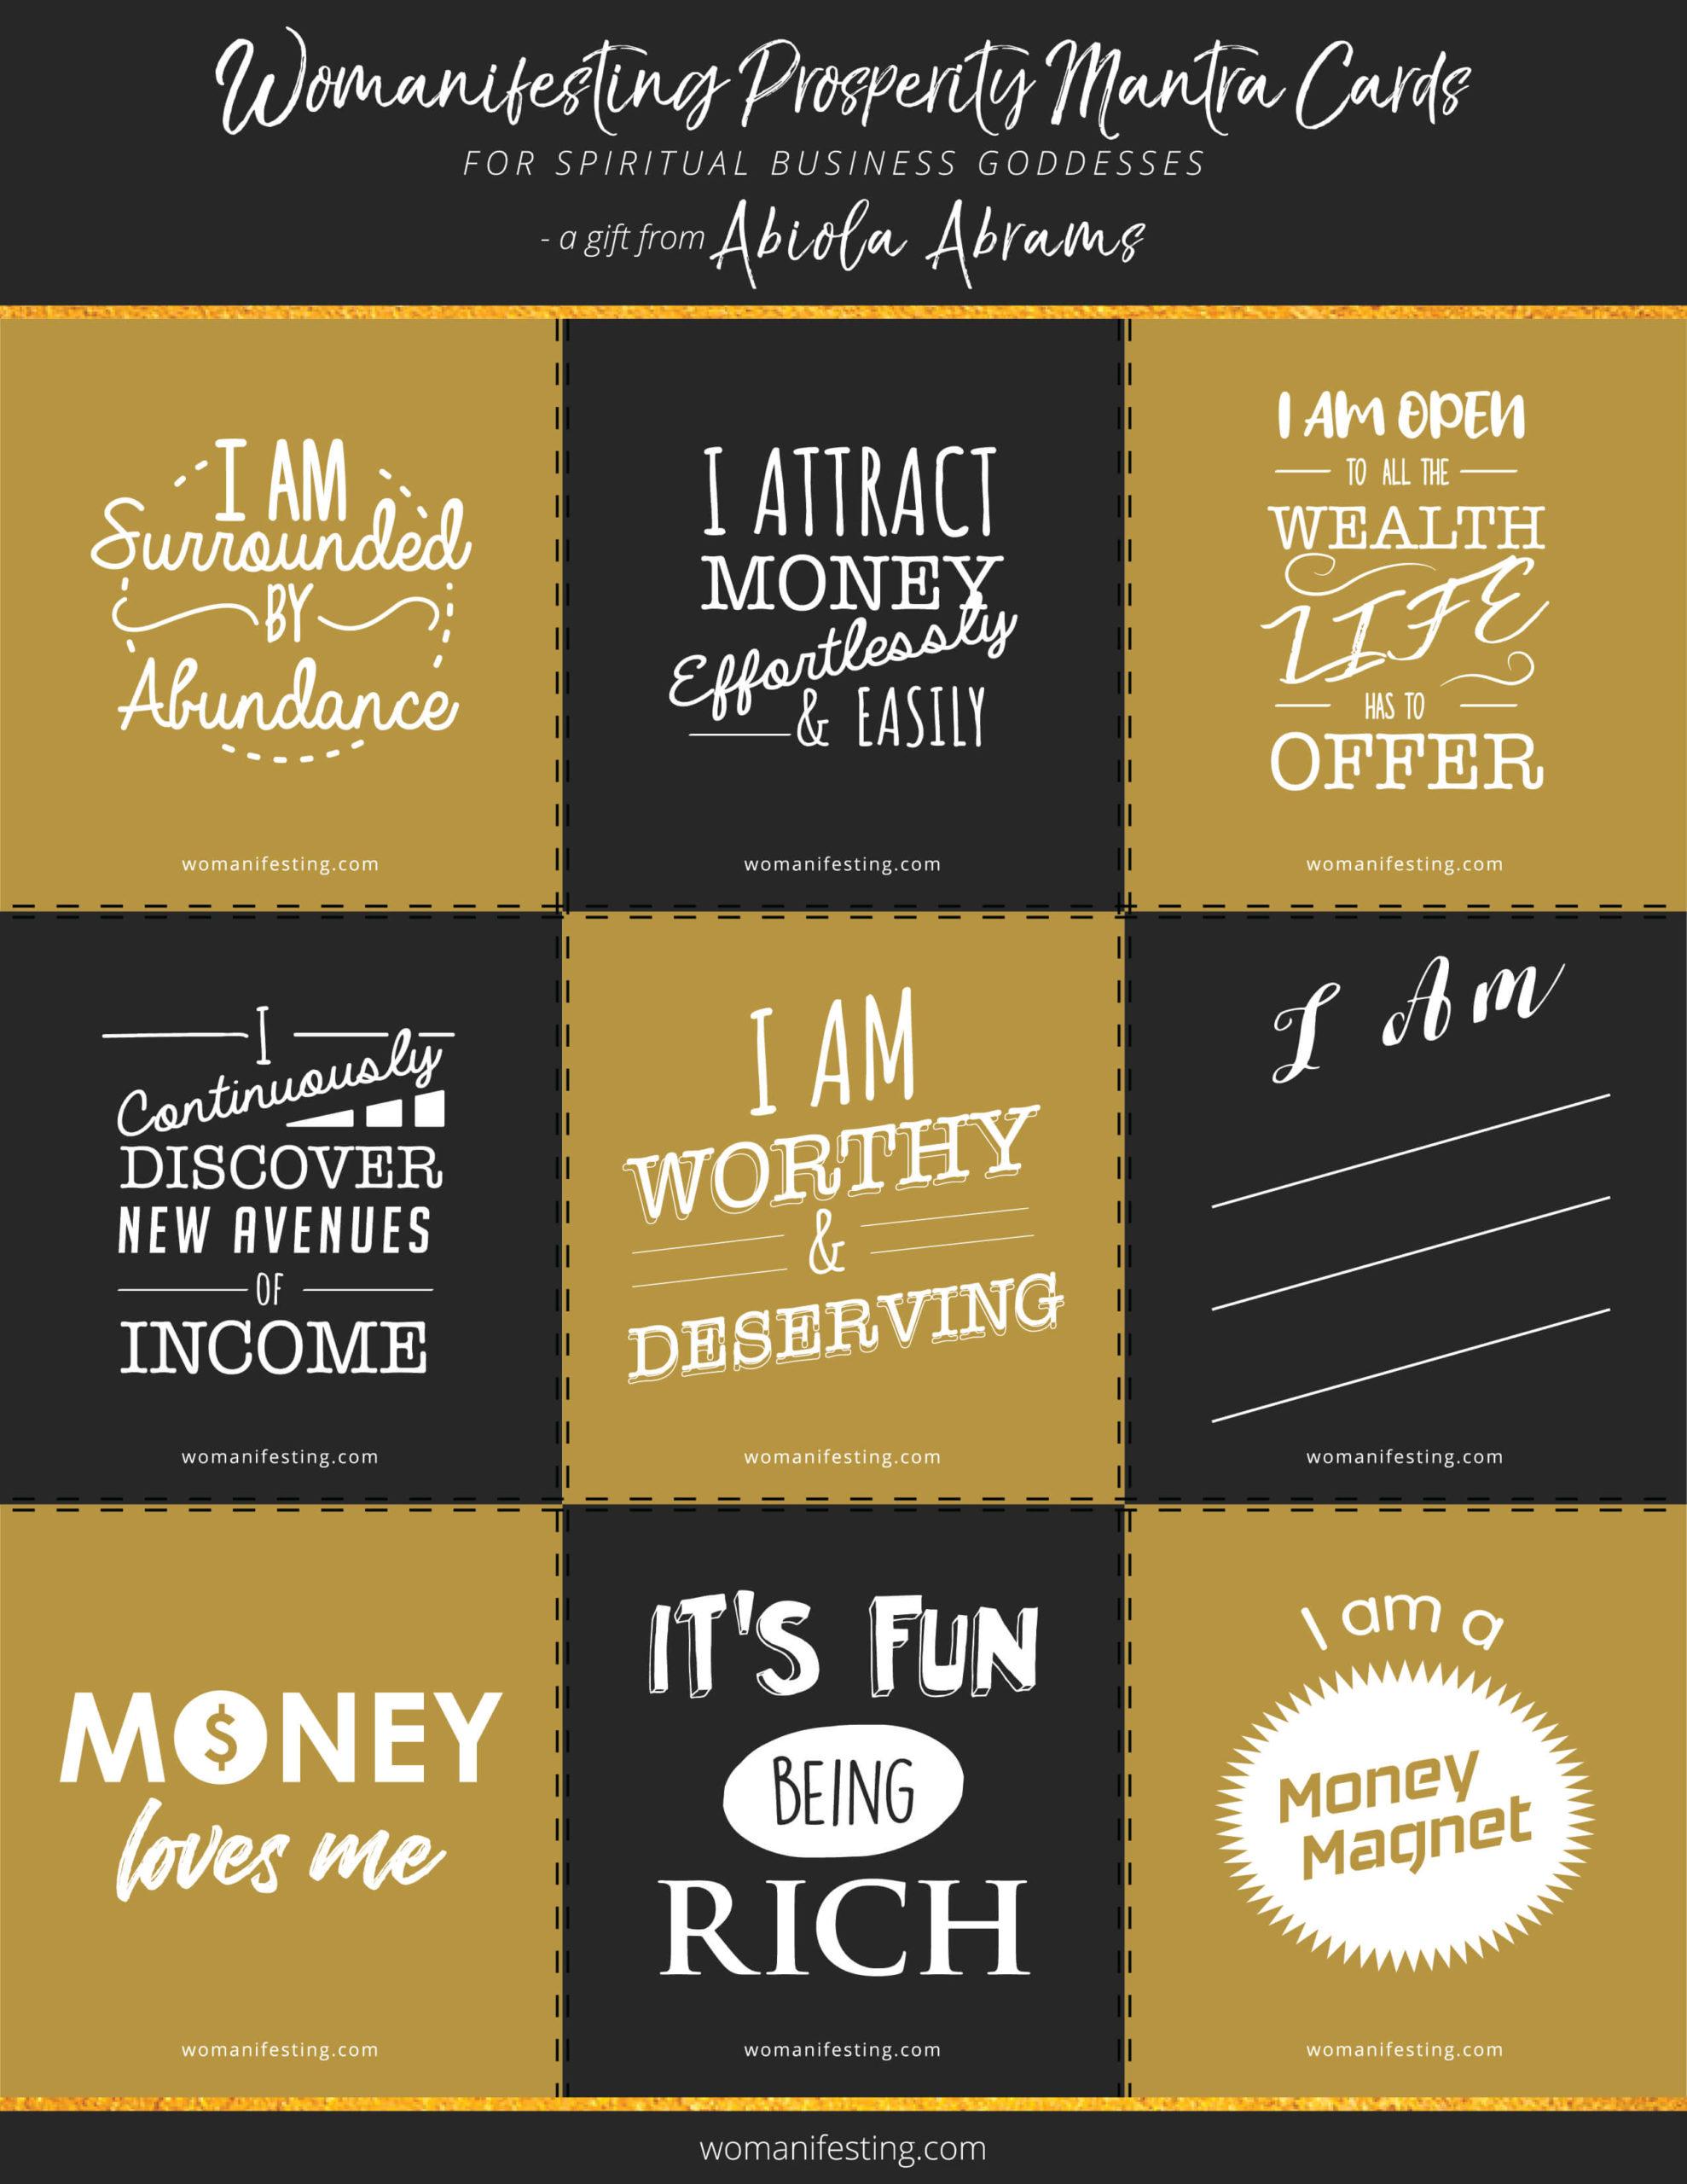 Free Printable Abundance and Prosperity Mantra Cards